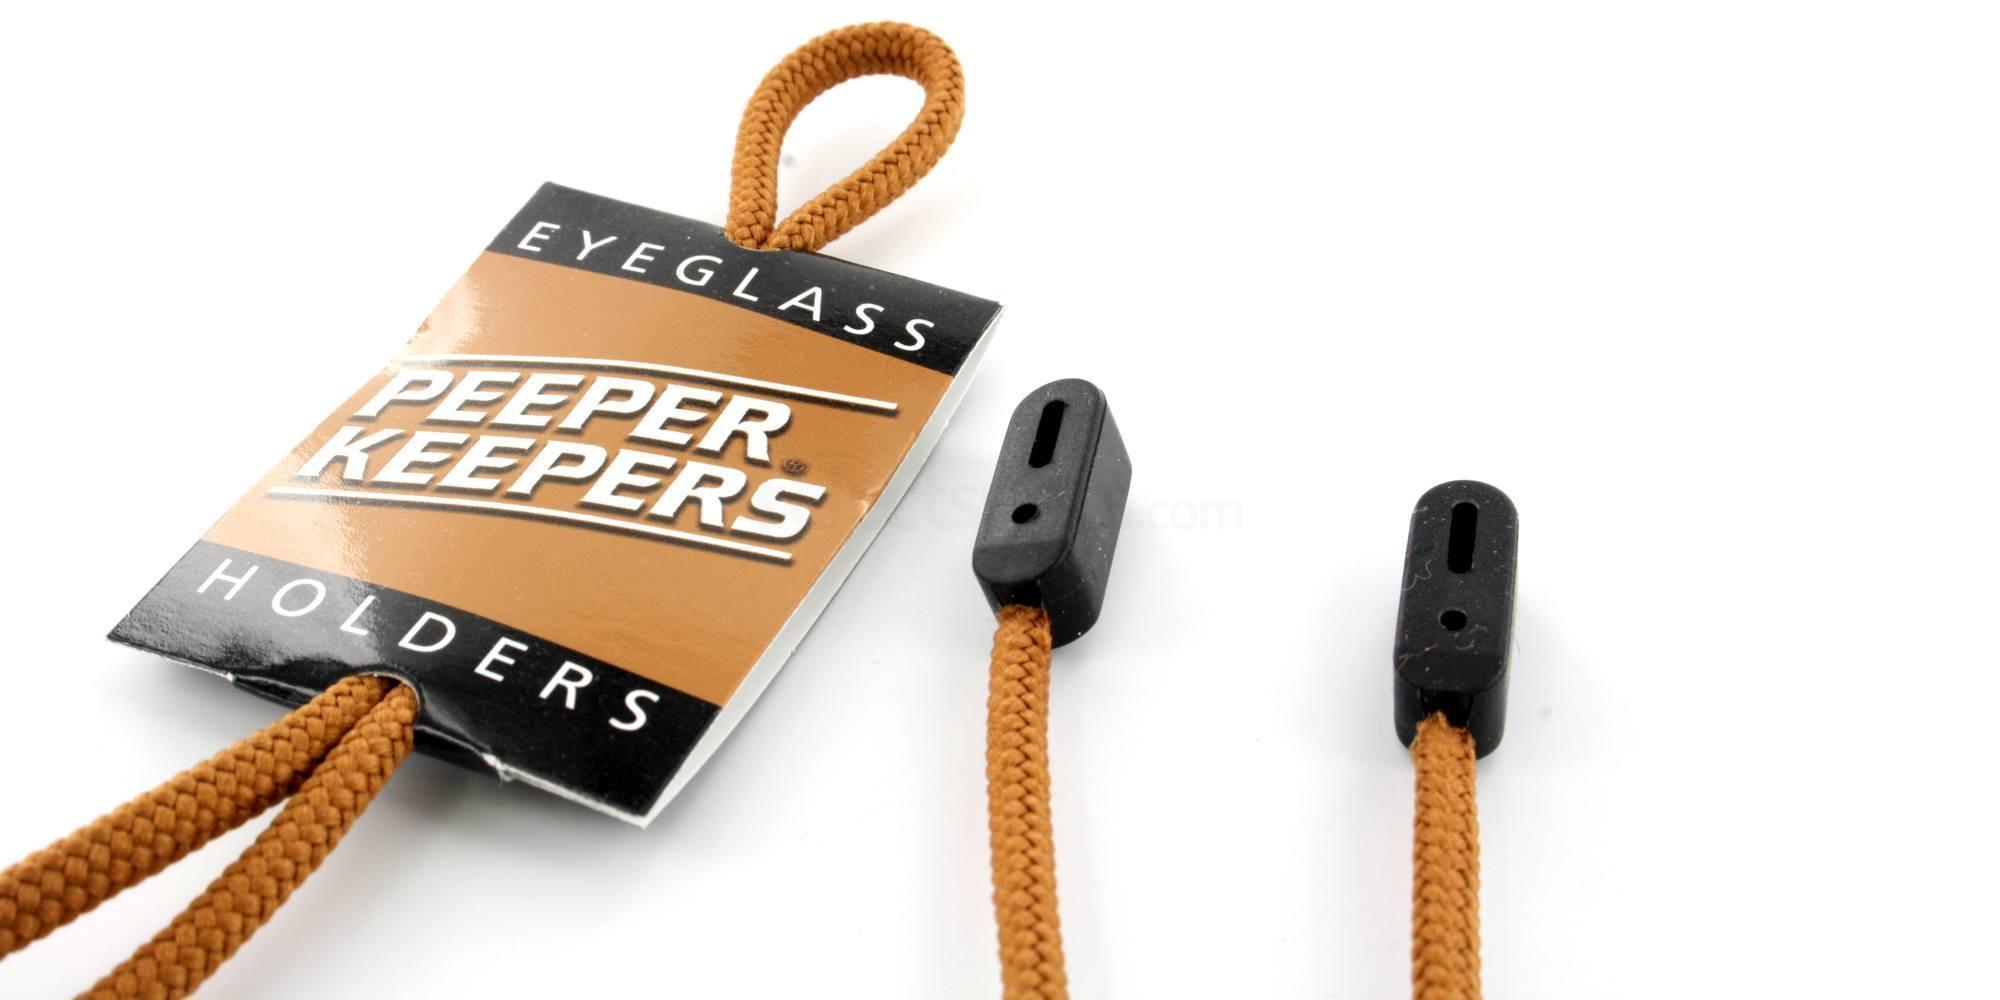 SCCP Supercord Copper Lanyard Accessories, Optical accessories